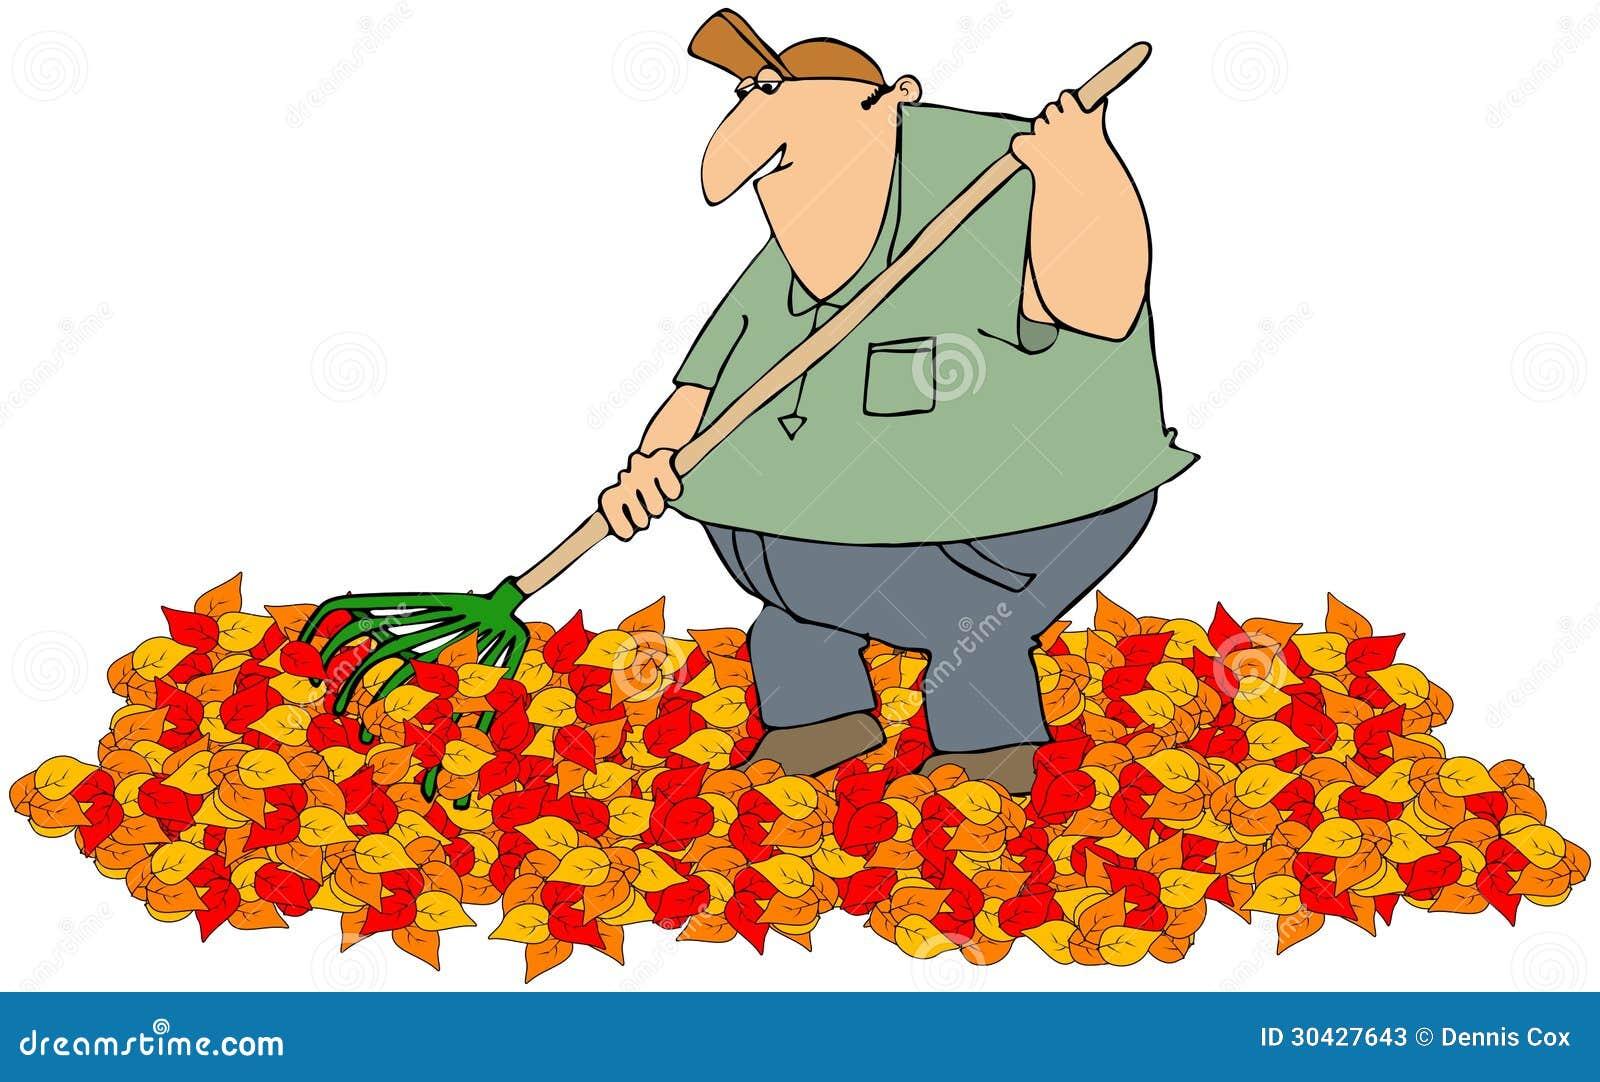 Autumn Leaves Pile Cartoon Stock Illustrations 147 Autumn Leaves Pile Cartoon Stock Illustrations Vectors Clipart Dreamstime